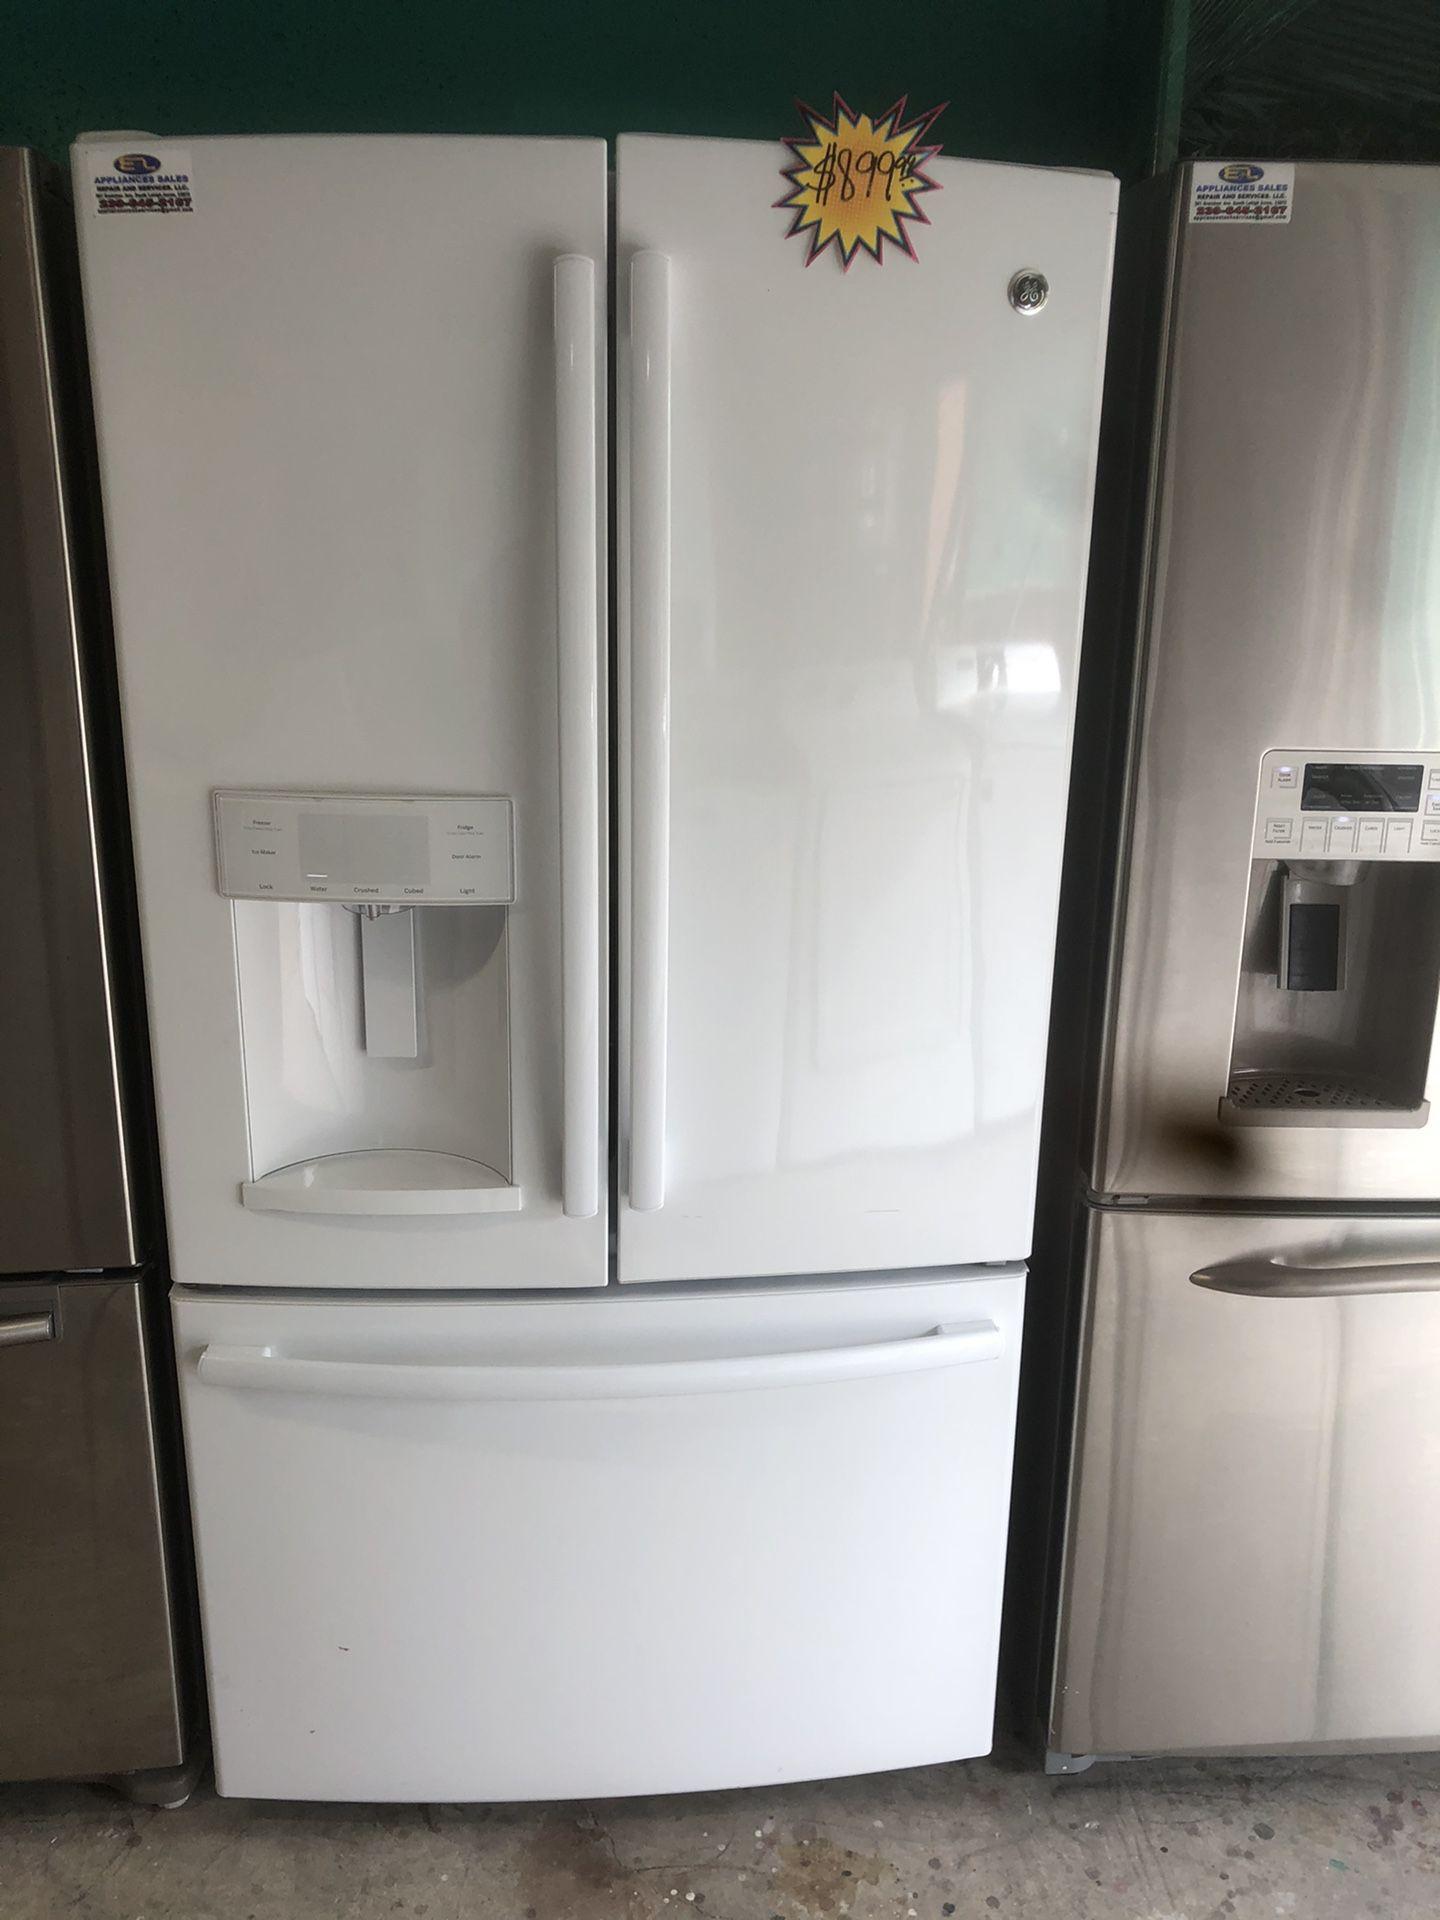 A white three door Ge refrigerator